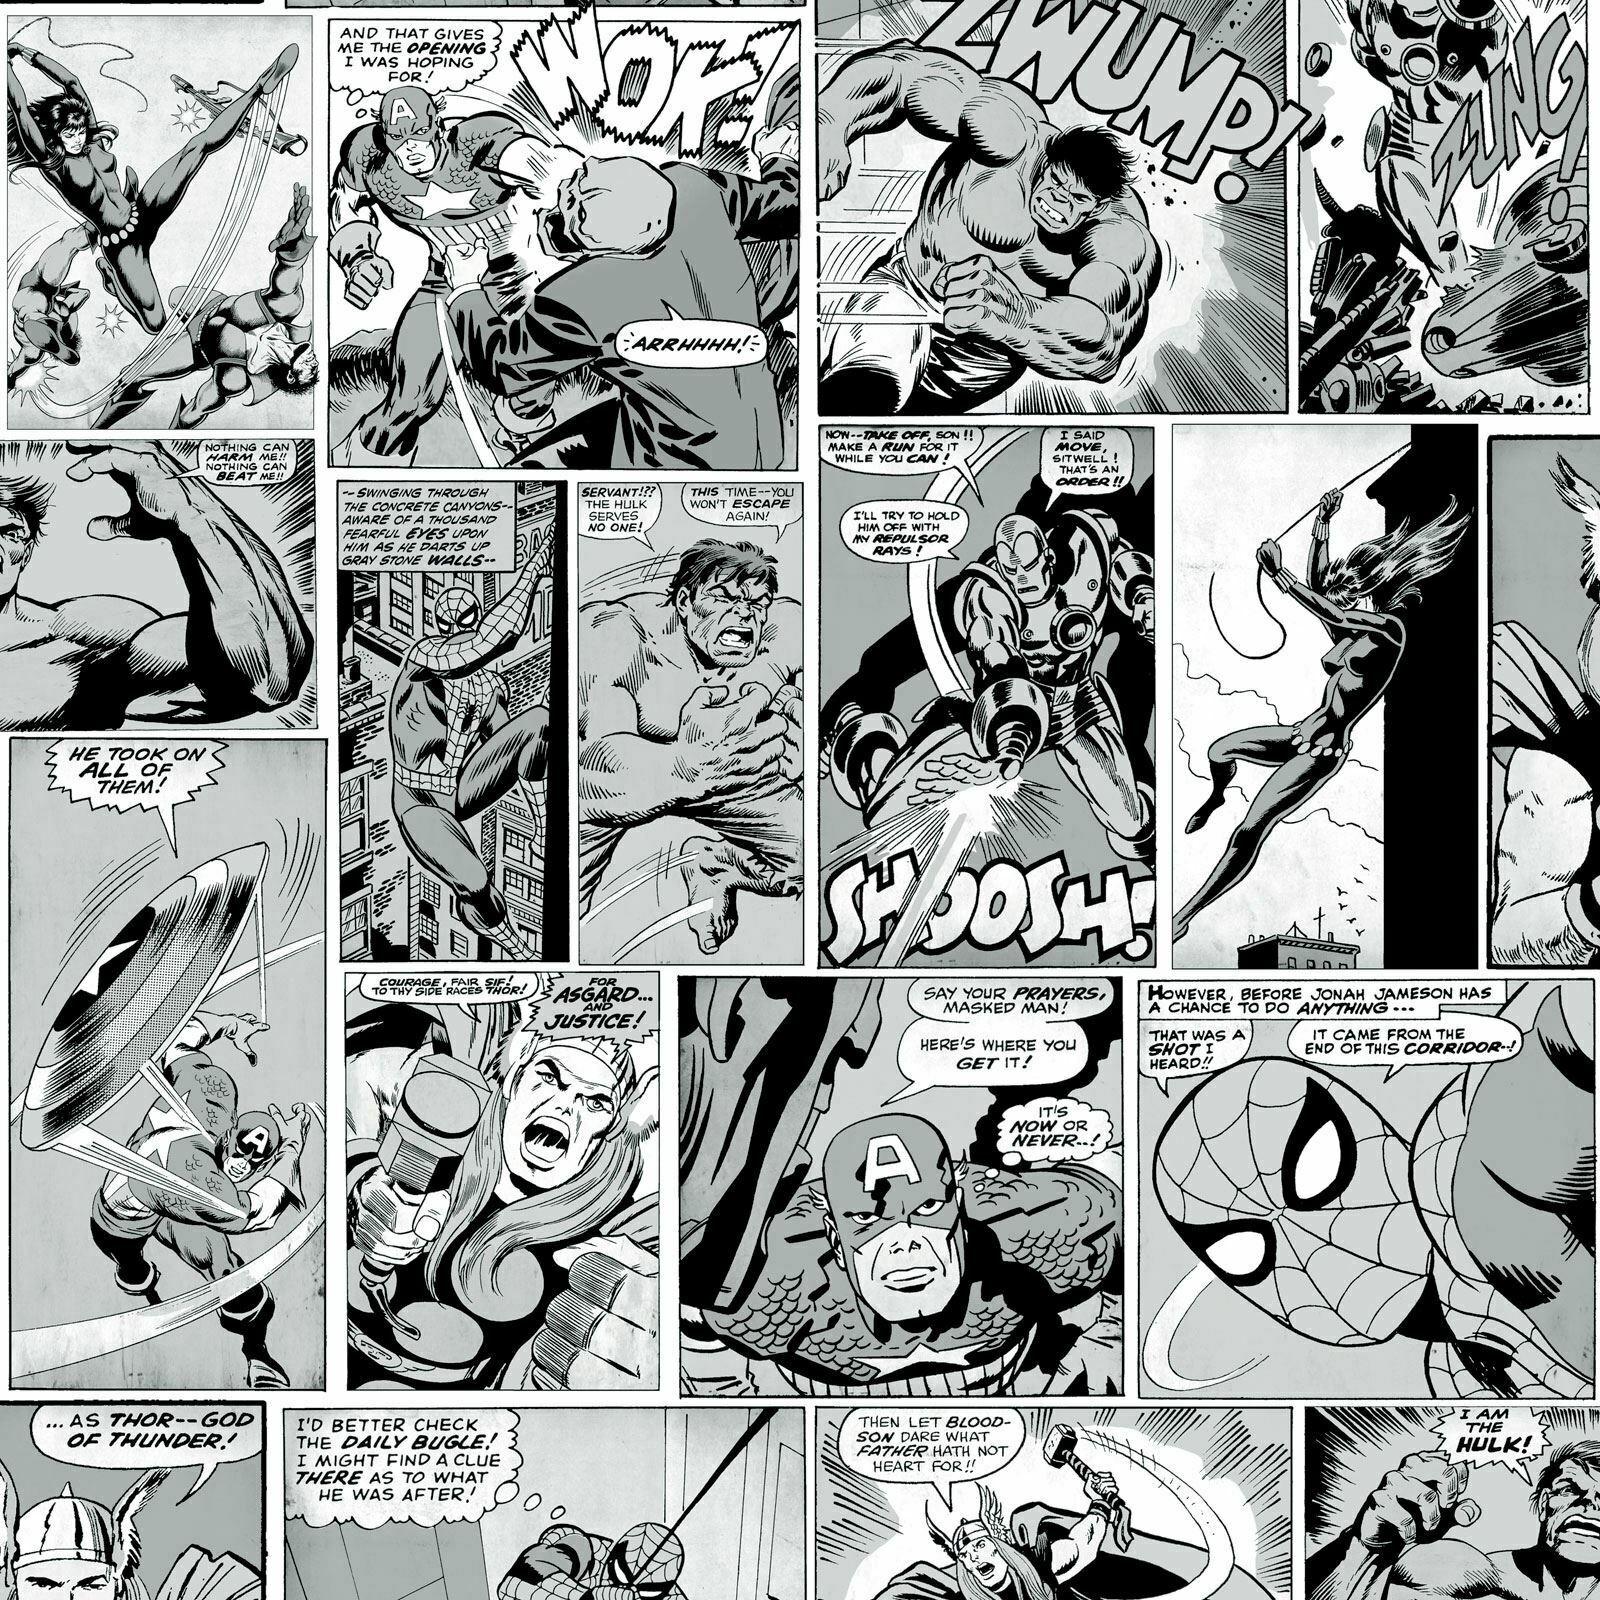 Marvel Marvel Comics Behang Striphelden Zwart Wit